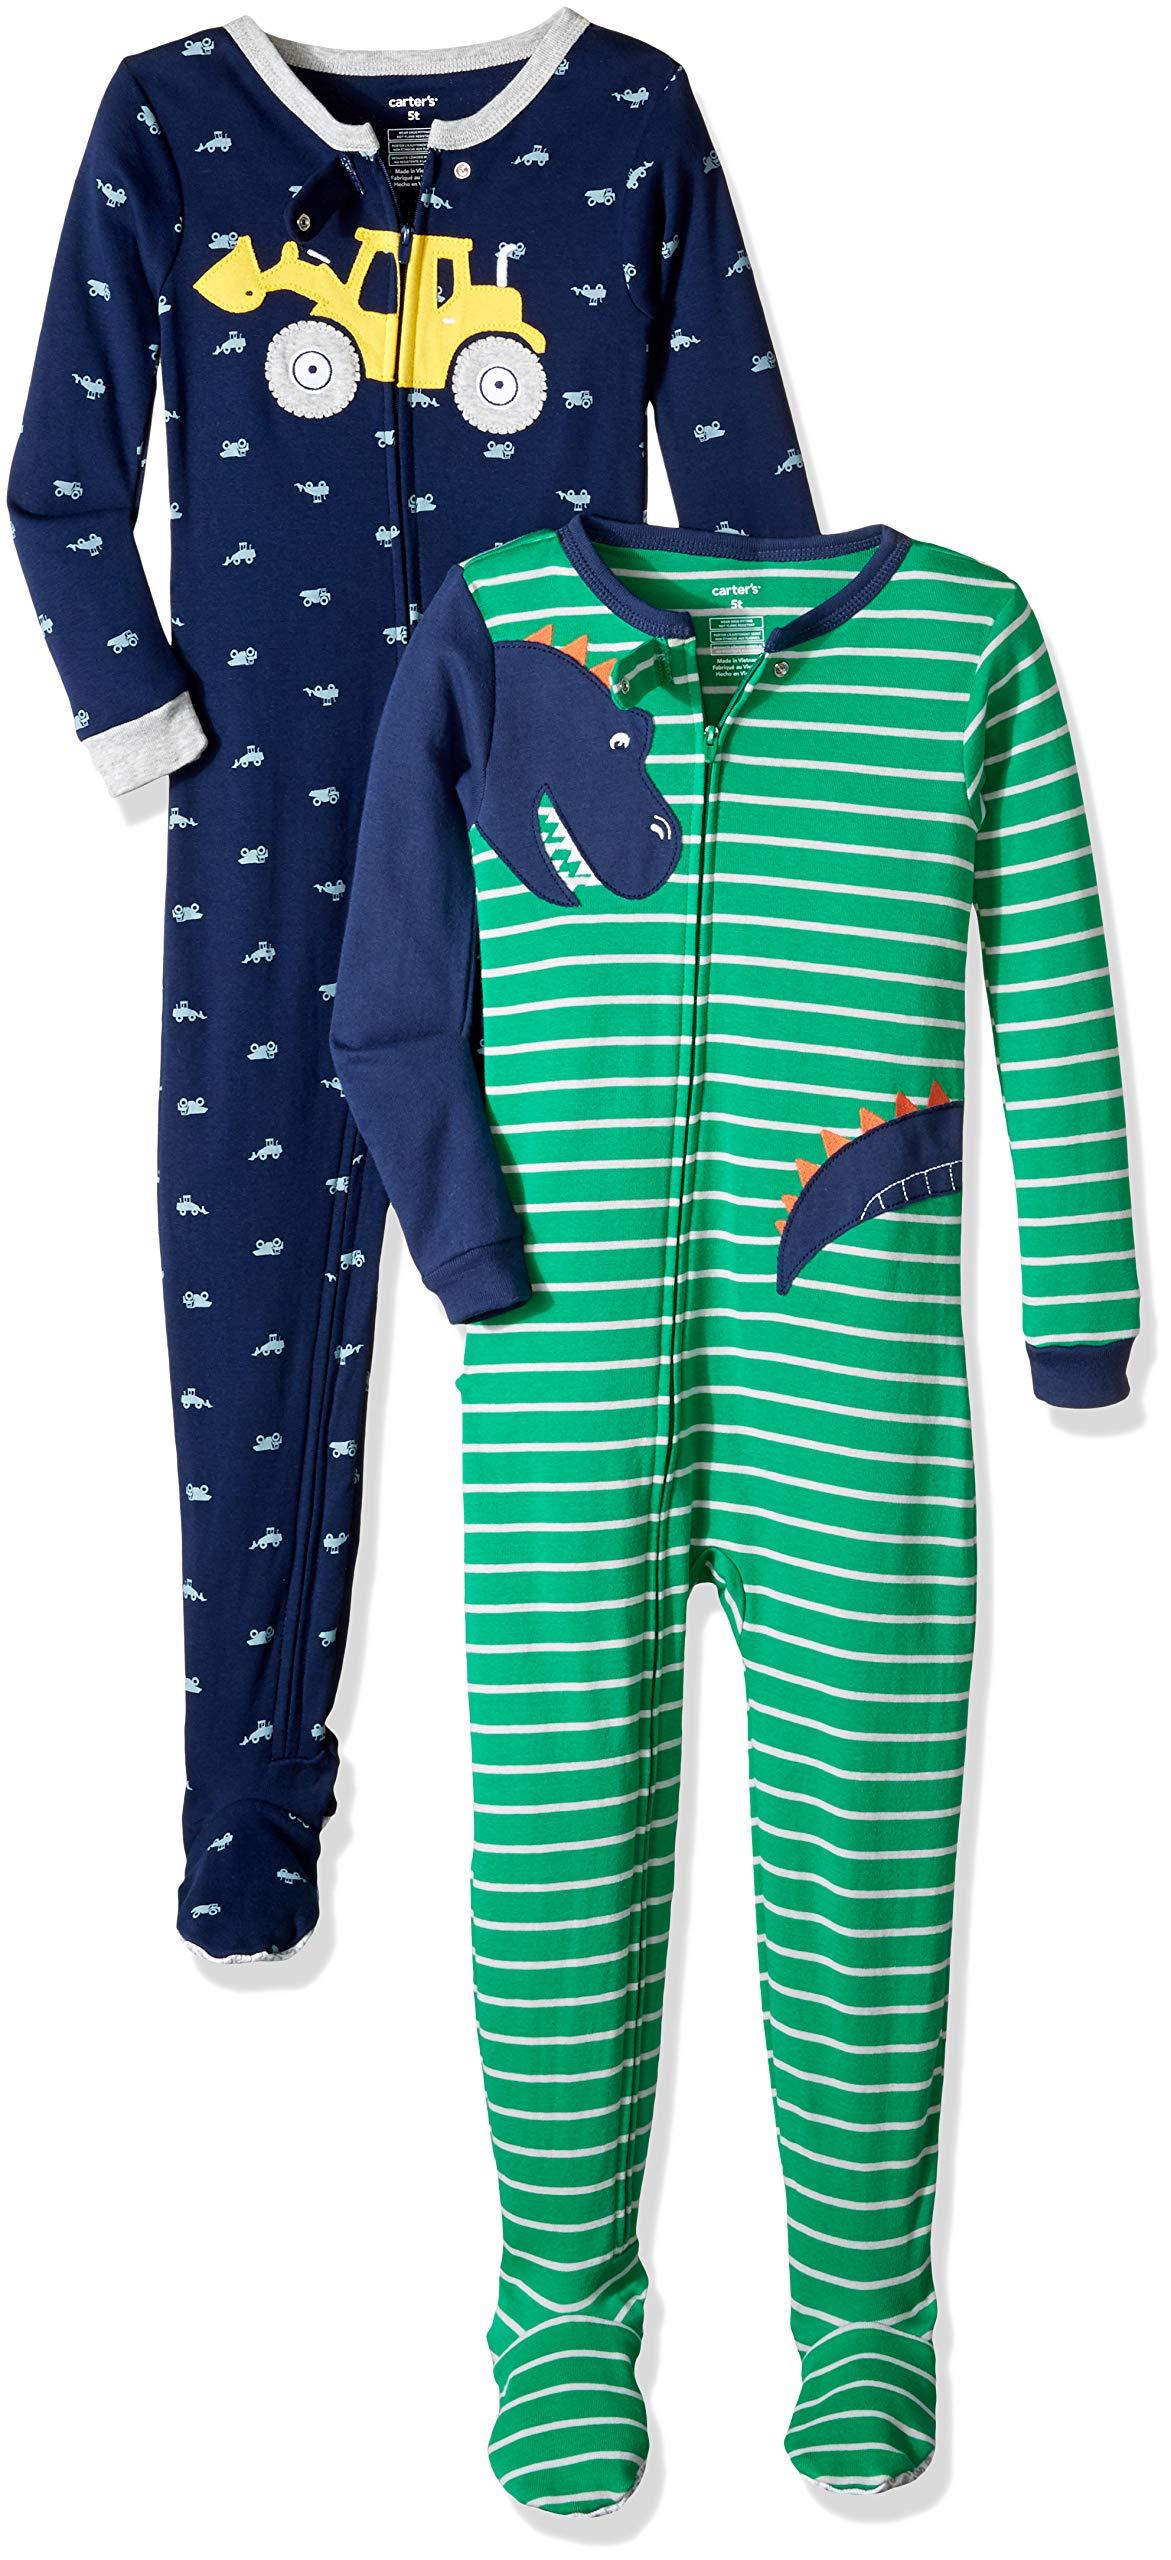 Carter's Boys' Toddler 2-Pack Cotton Footed Pajamas, Dinosaur/Digger, 3T